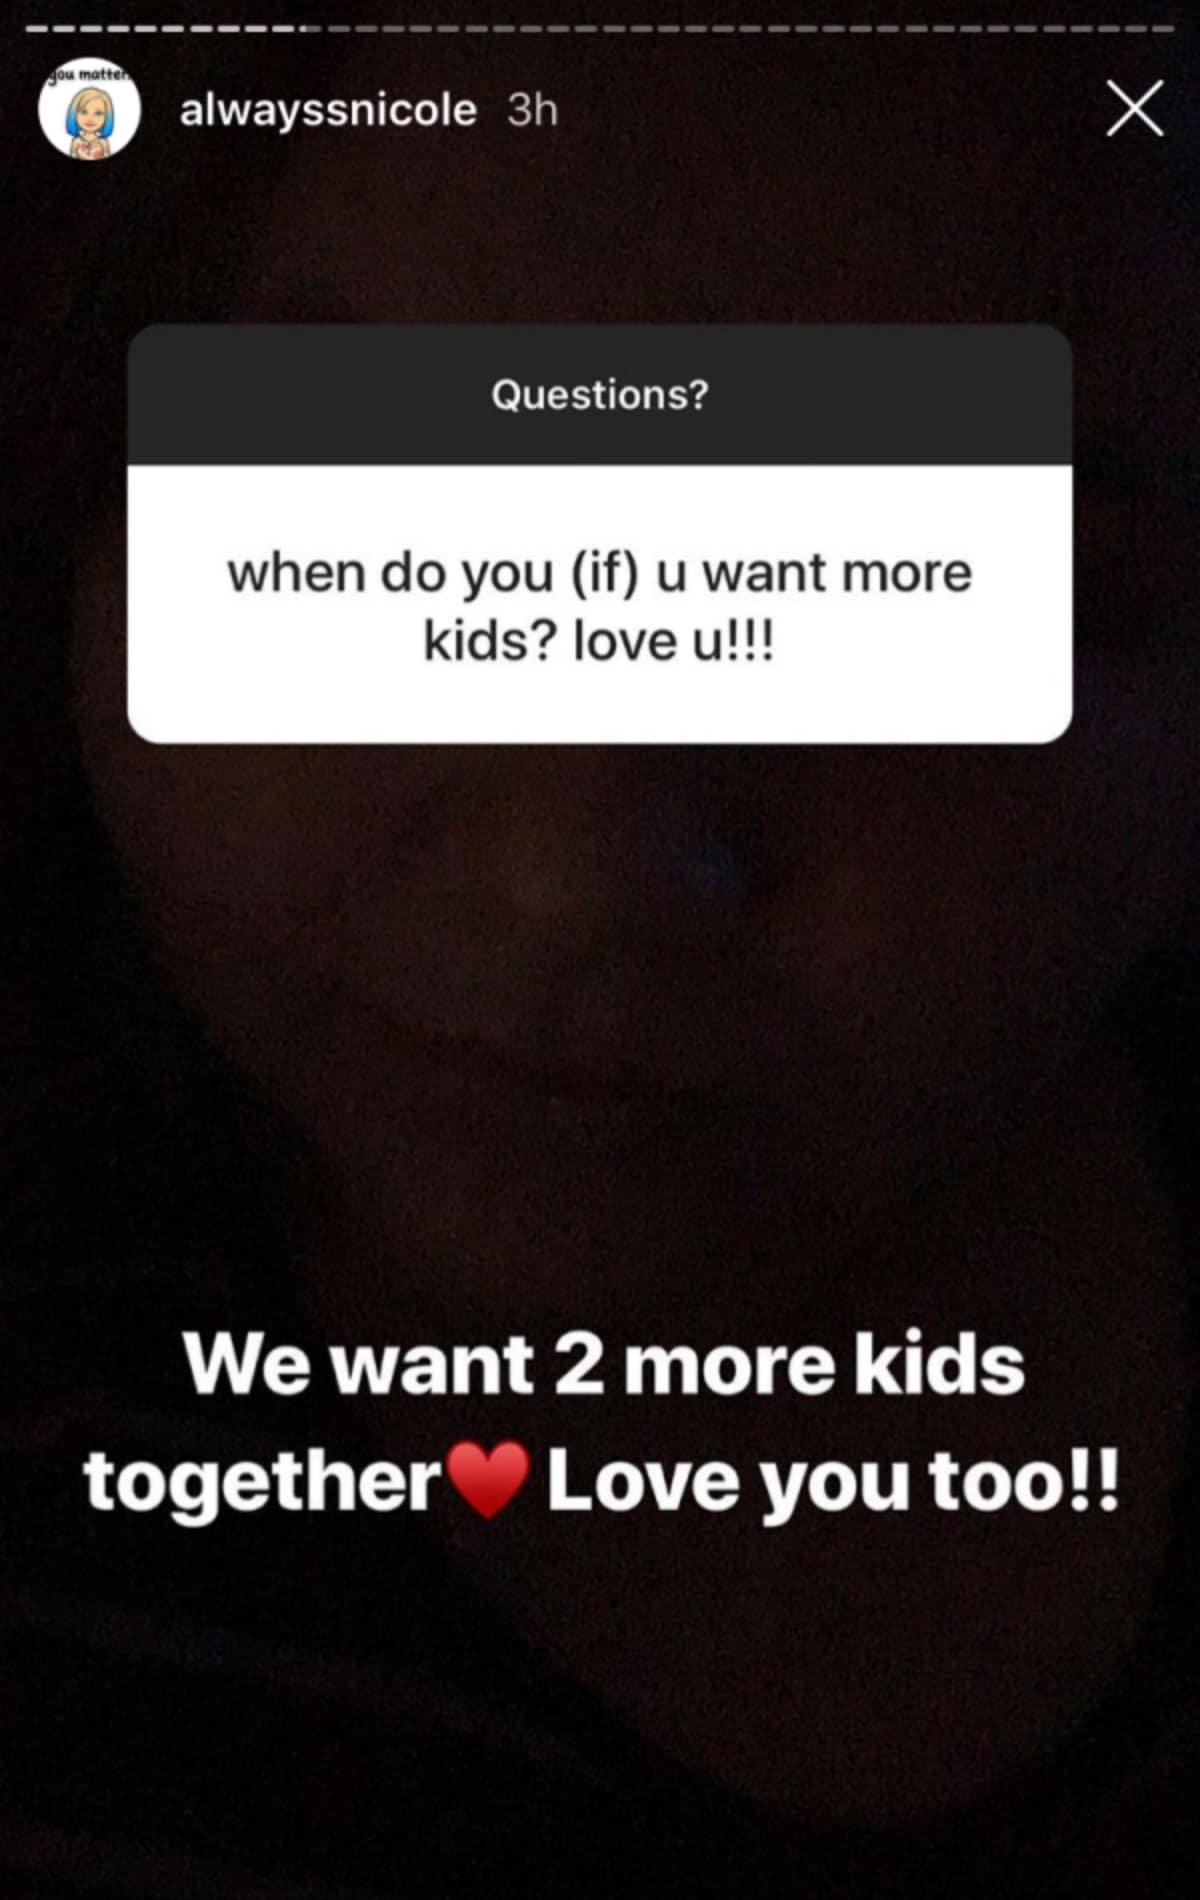 Nicole Nafziger's Instagram Q&A